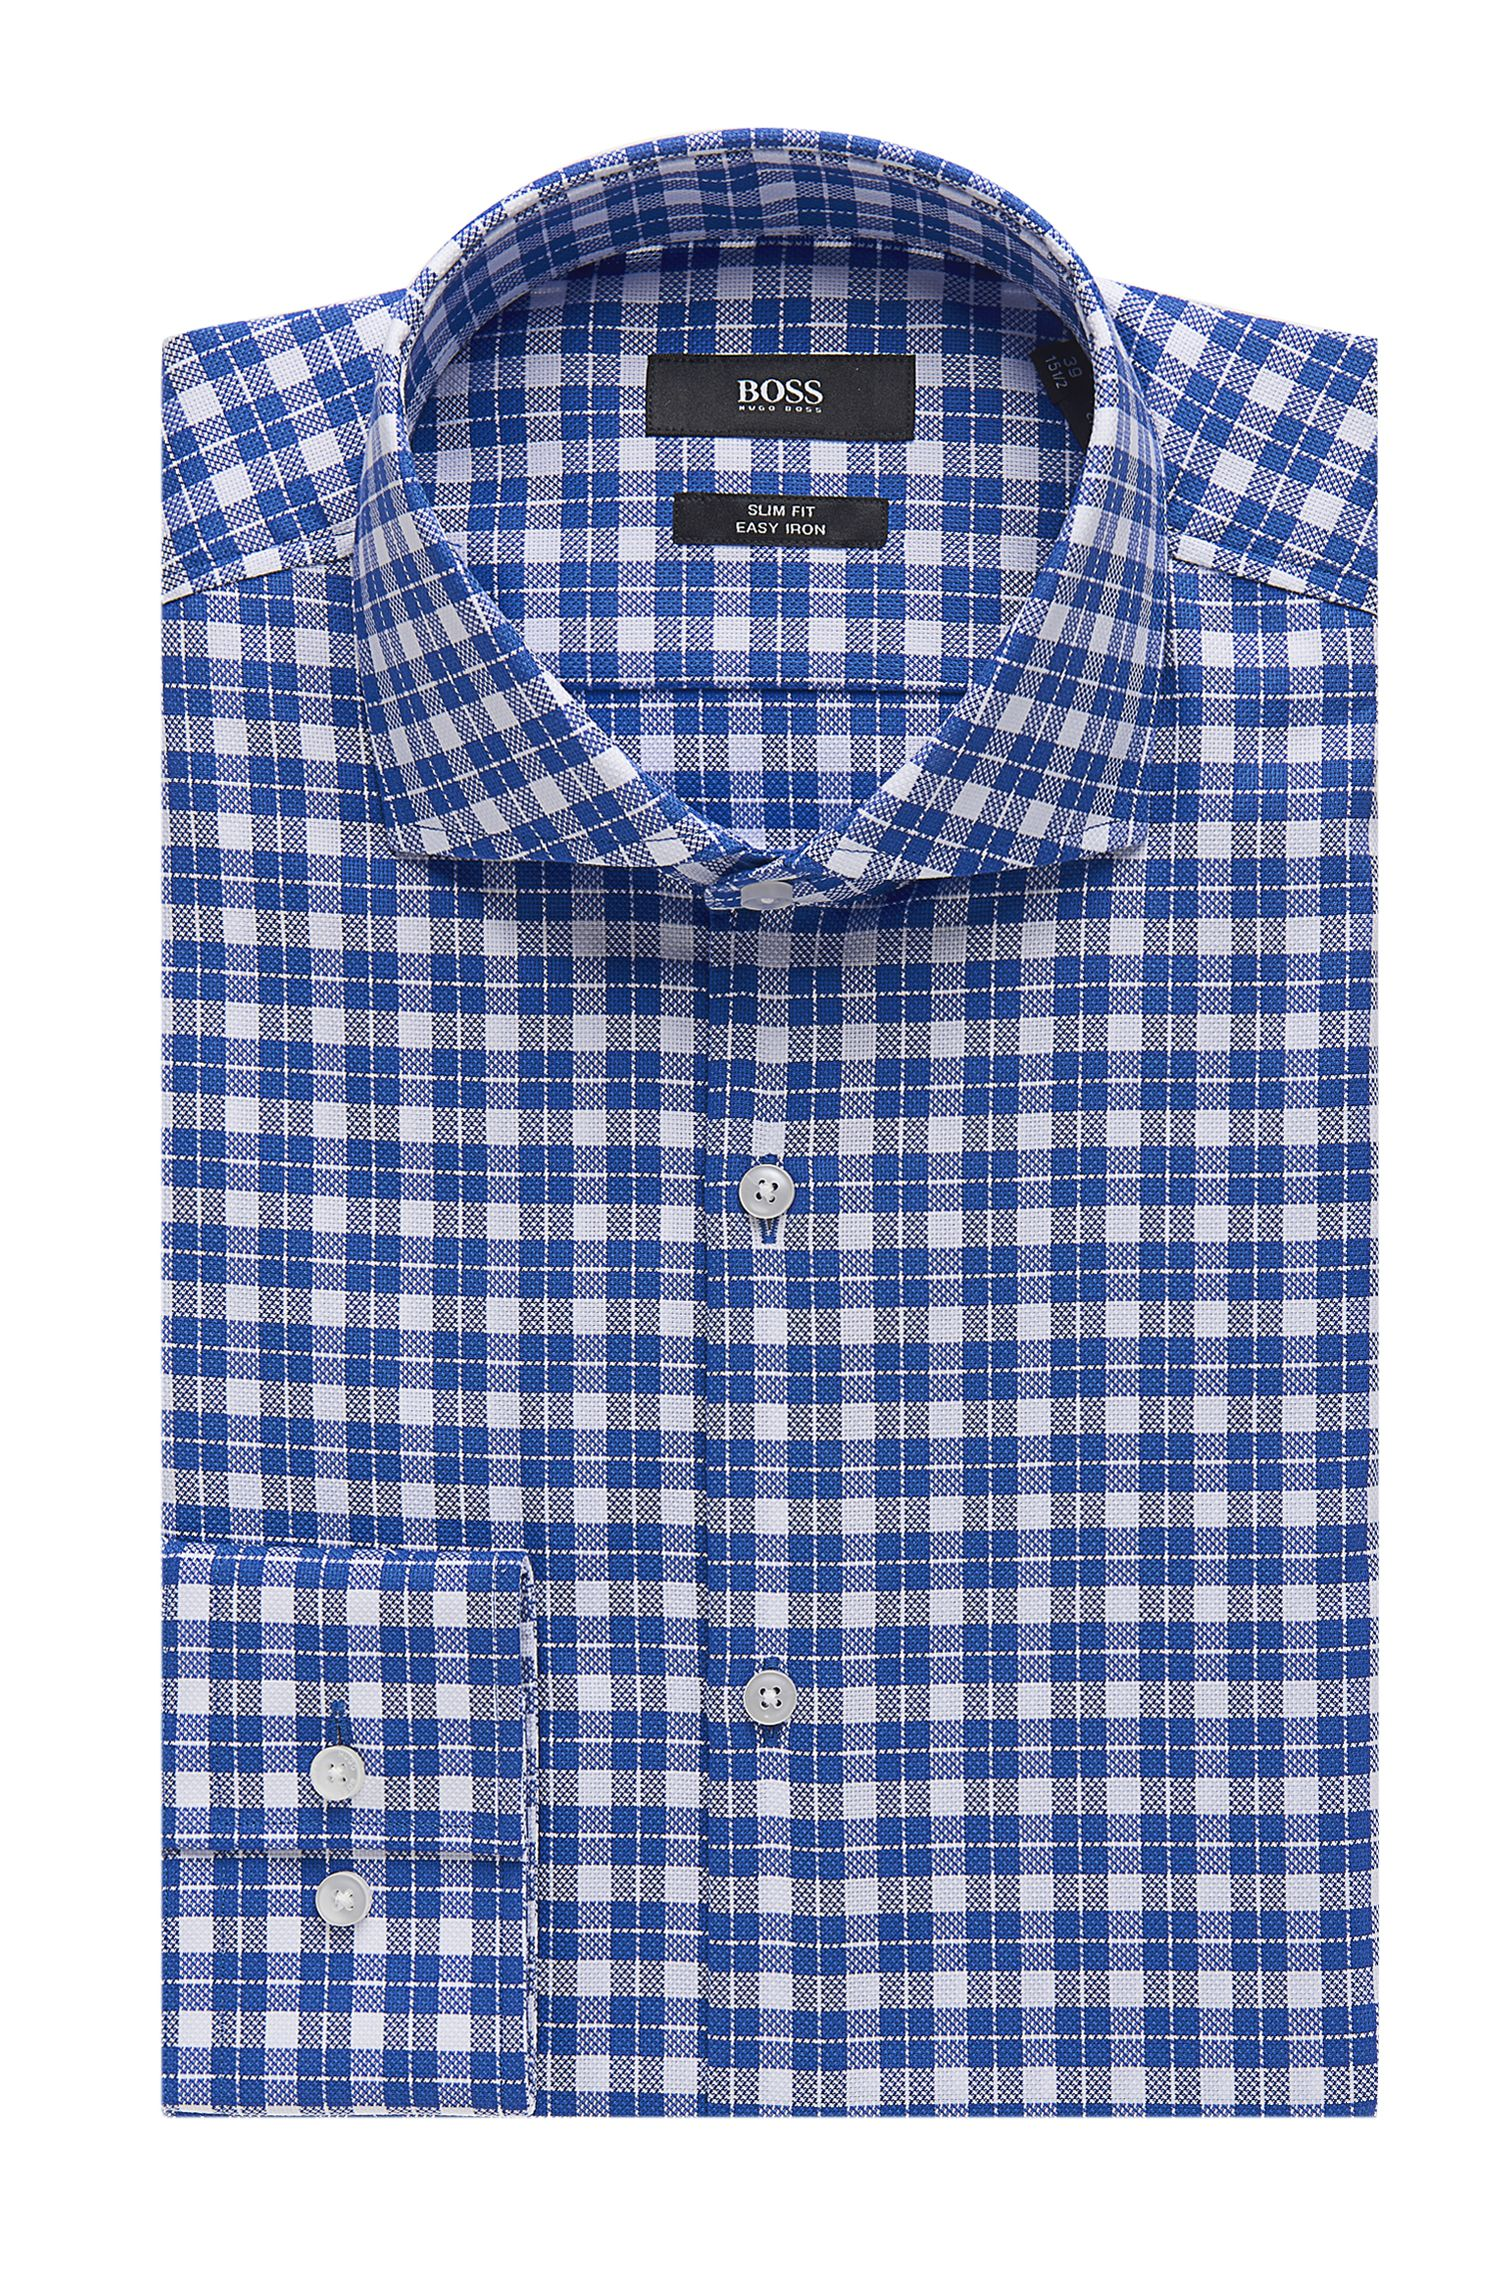 Check Easy Iron Cotton Dress Shirt, Slim Fit | Jason